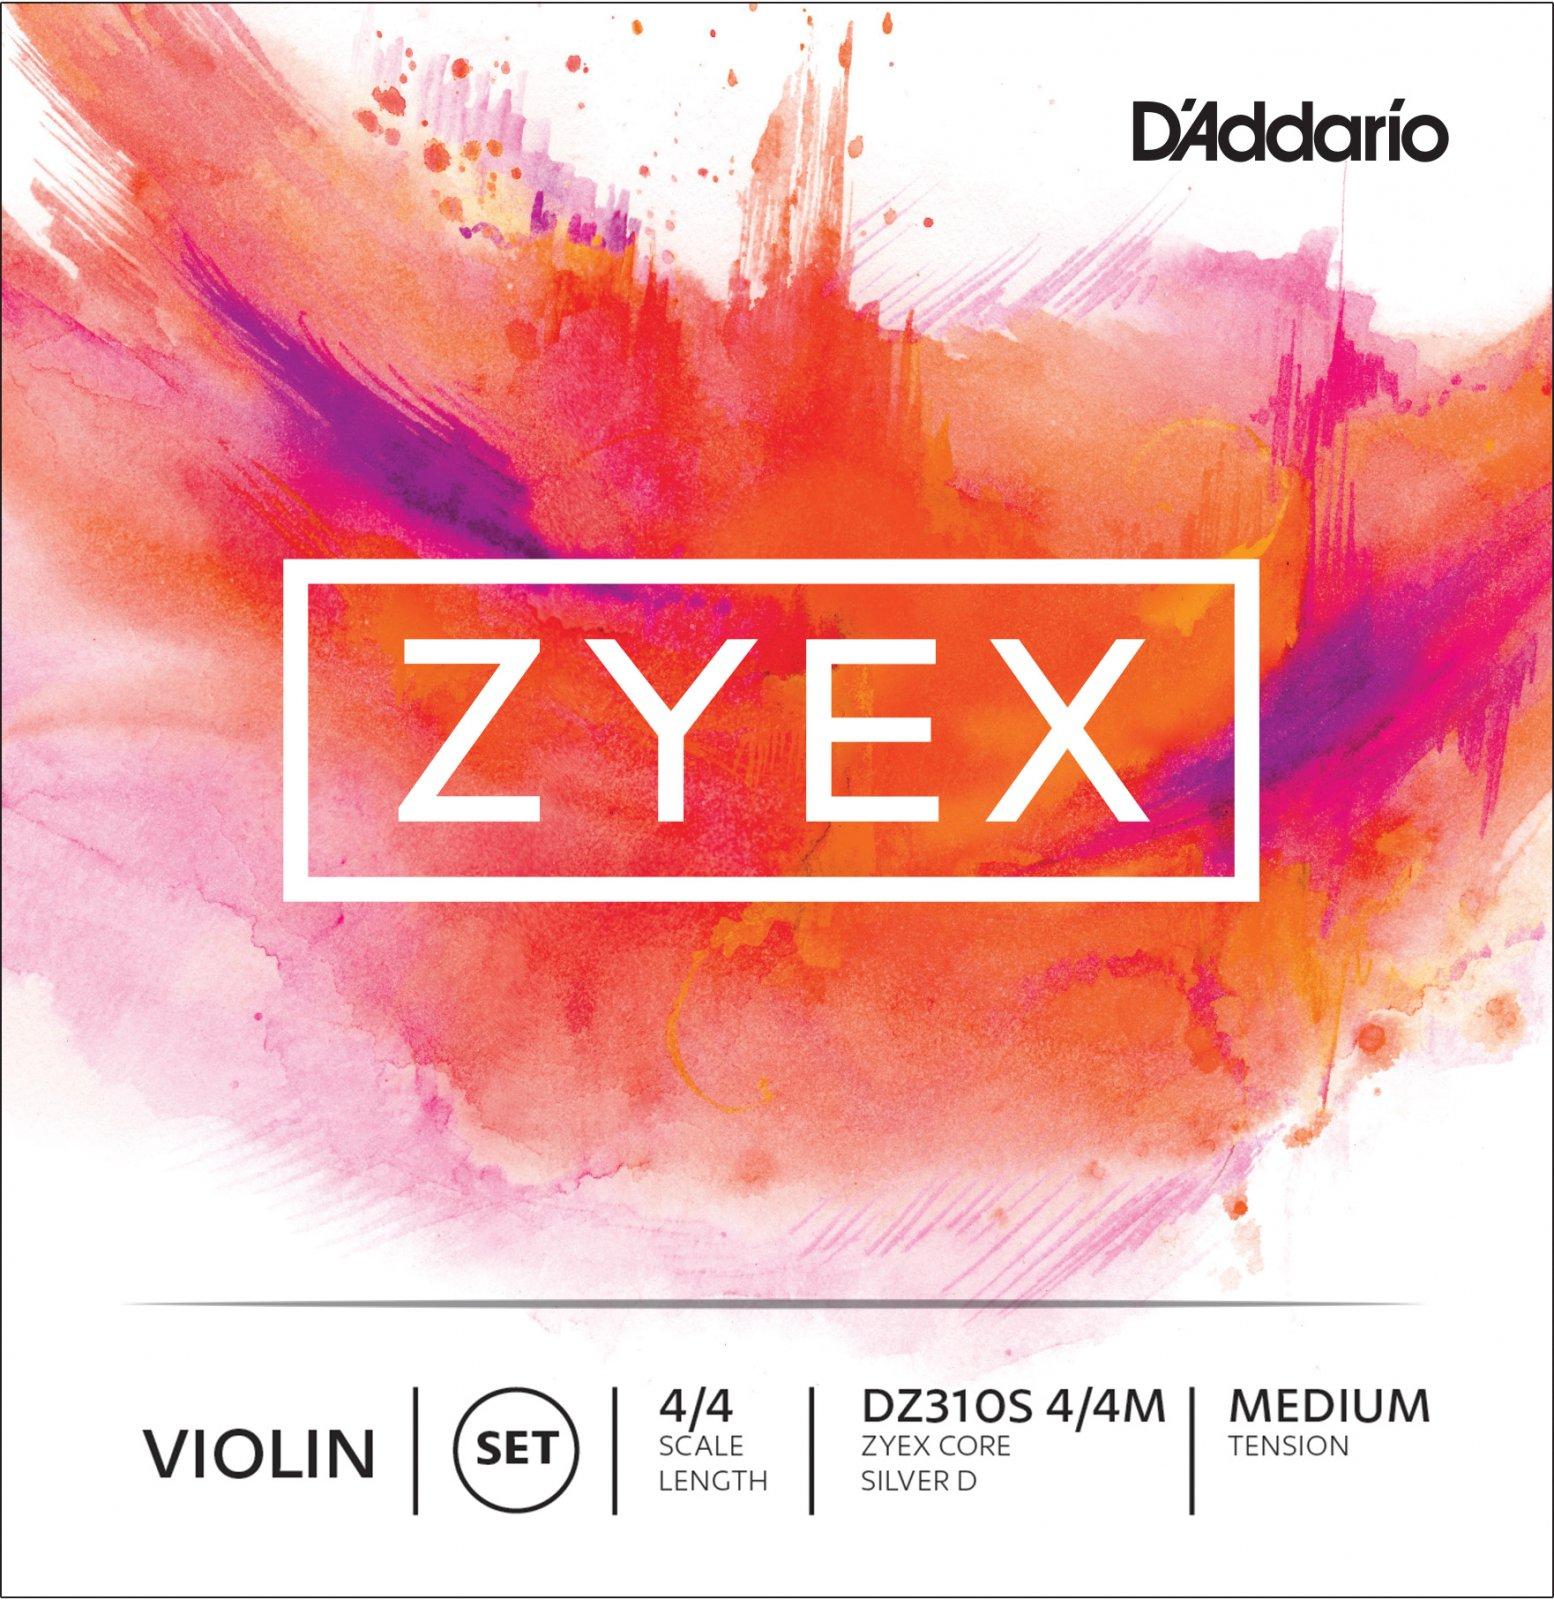 D'Addario DZ310S Zyex Violin String Set with Silver D 4/4 Scale Medium Tension